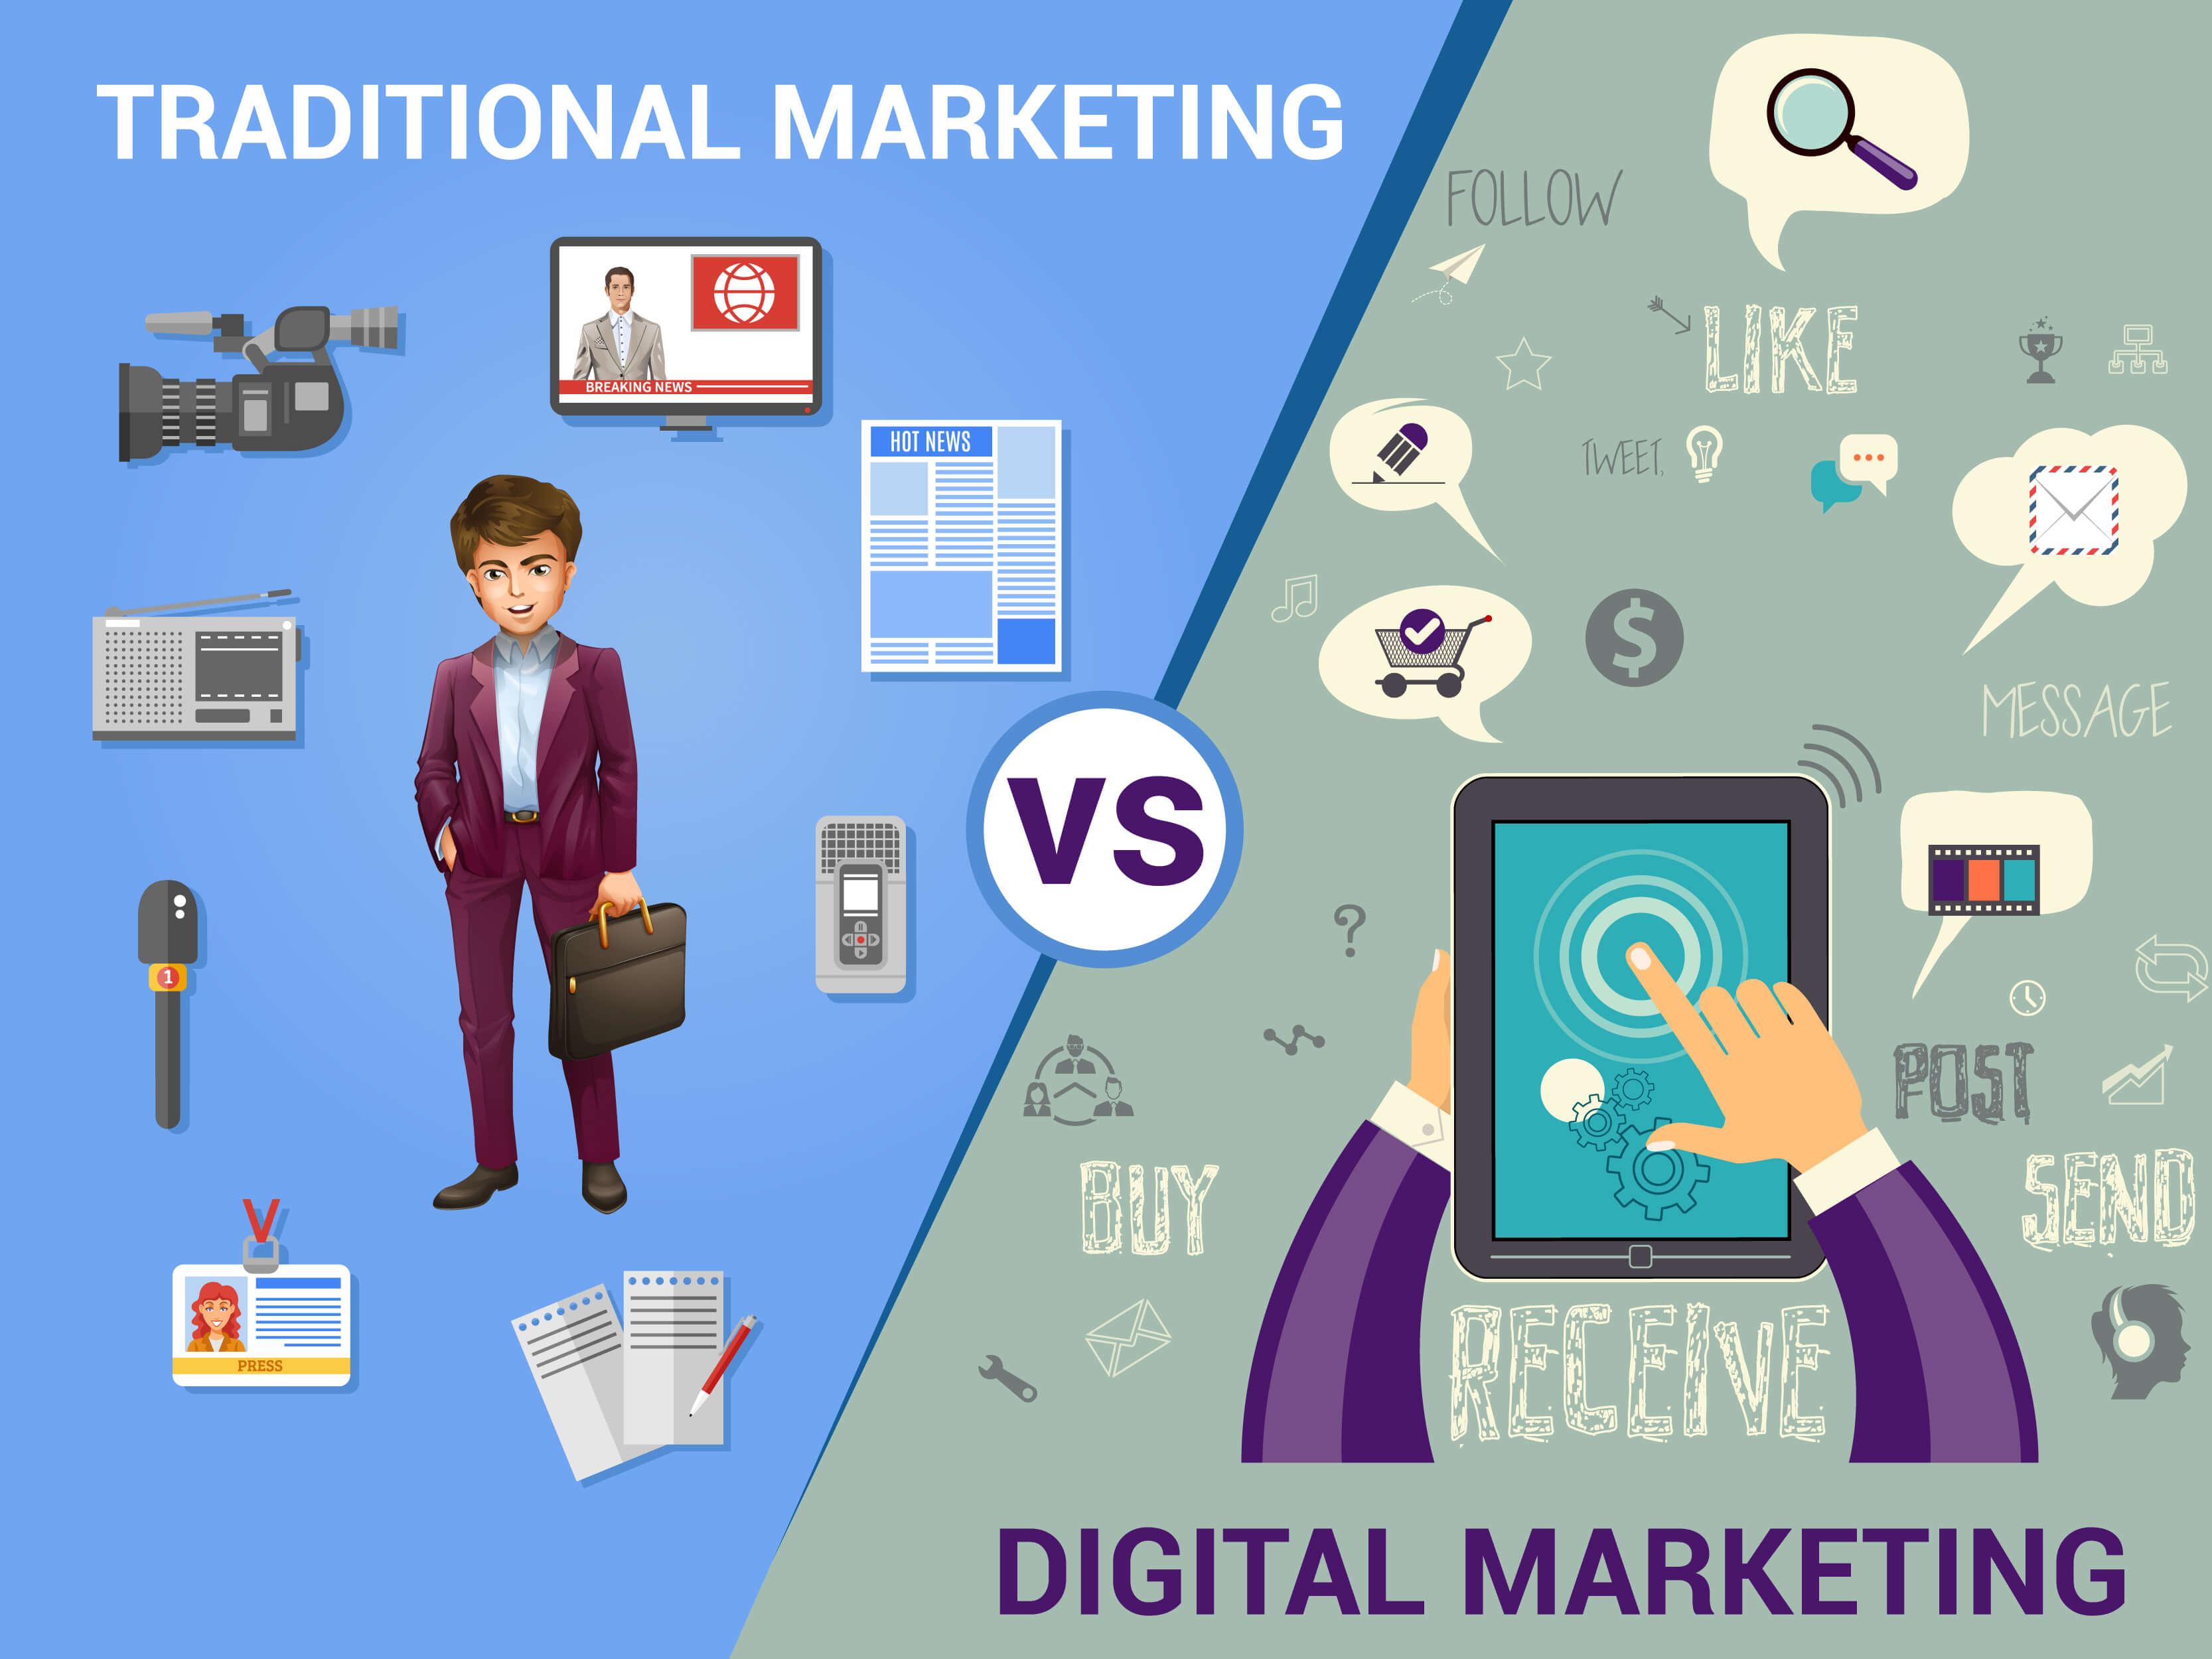 Law Firm Marketing Strategies: Traditional vs Digital